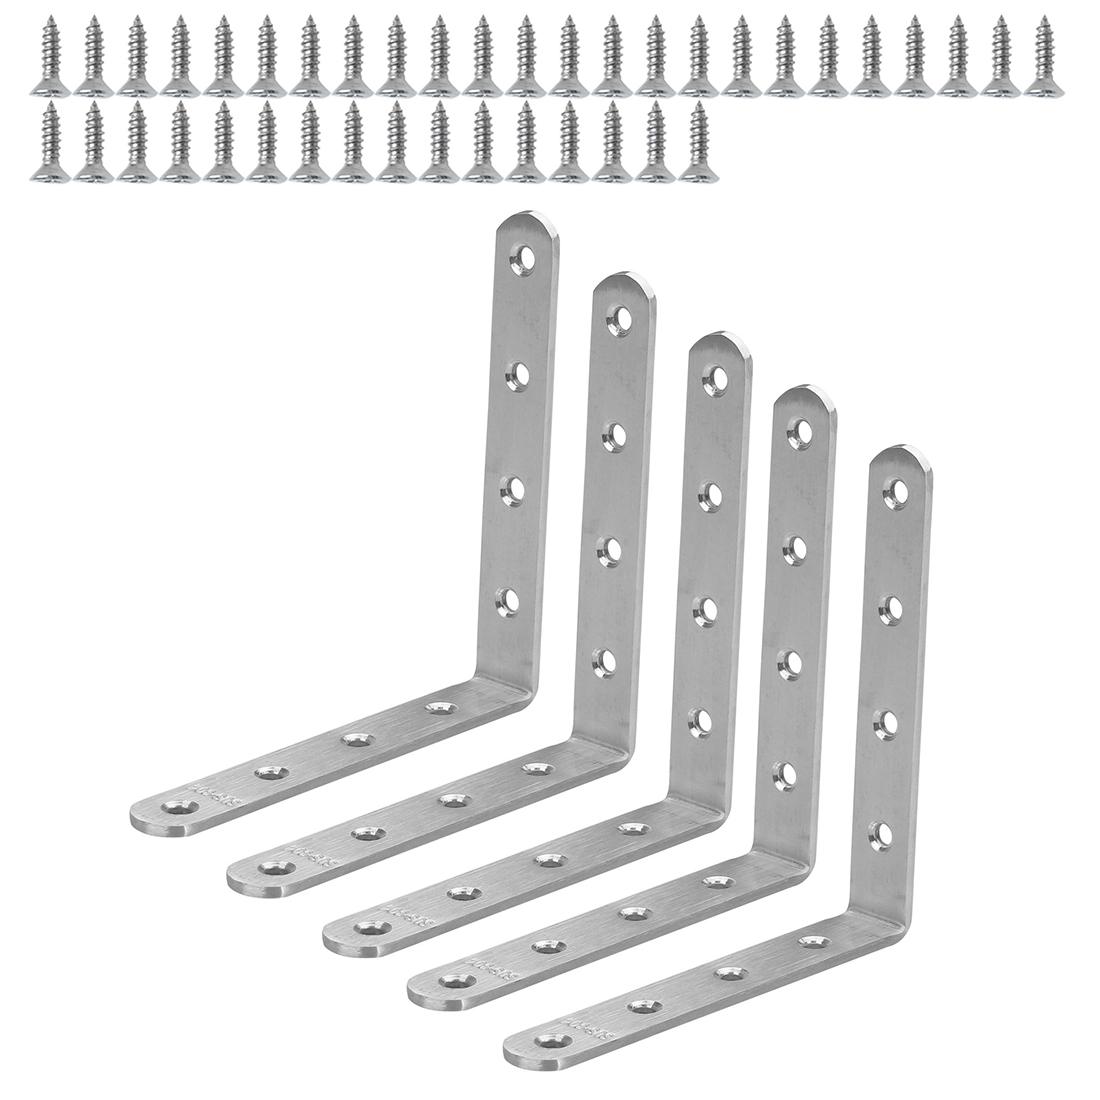 Angle Bracket Stainless Steel Brace Fastener Support w Screws 125 x 125mm, 5pcs